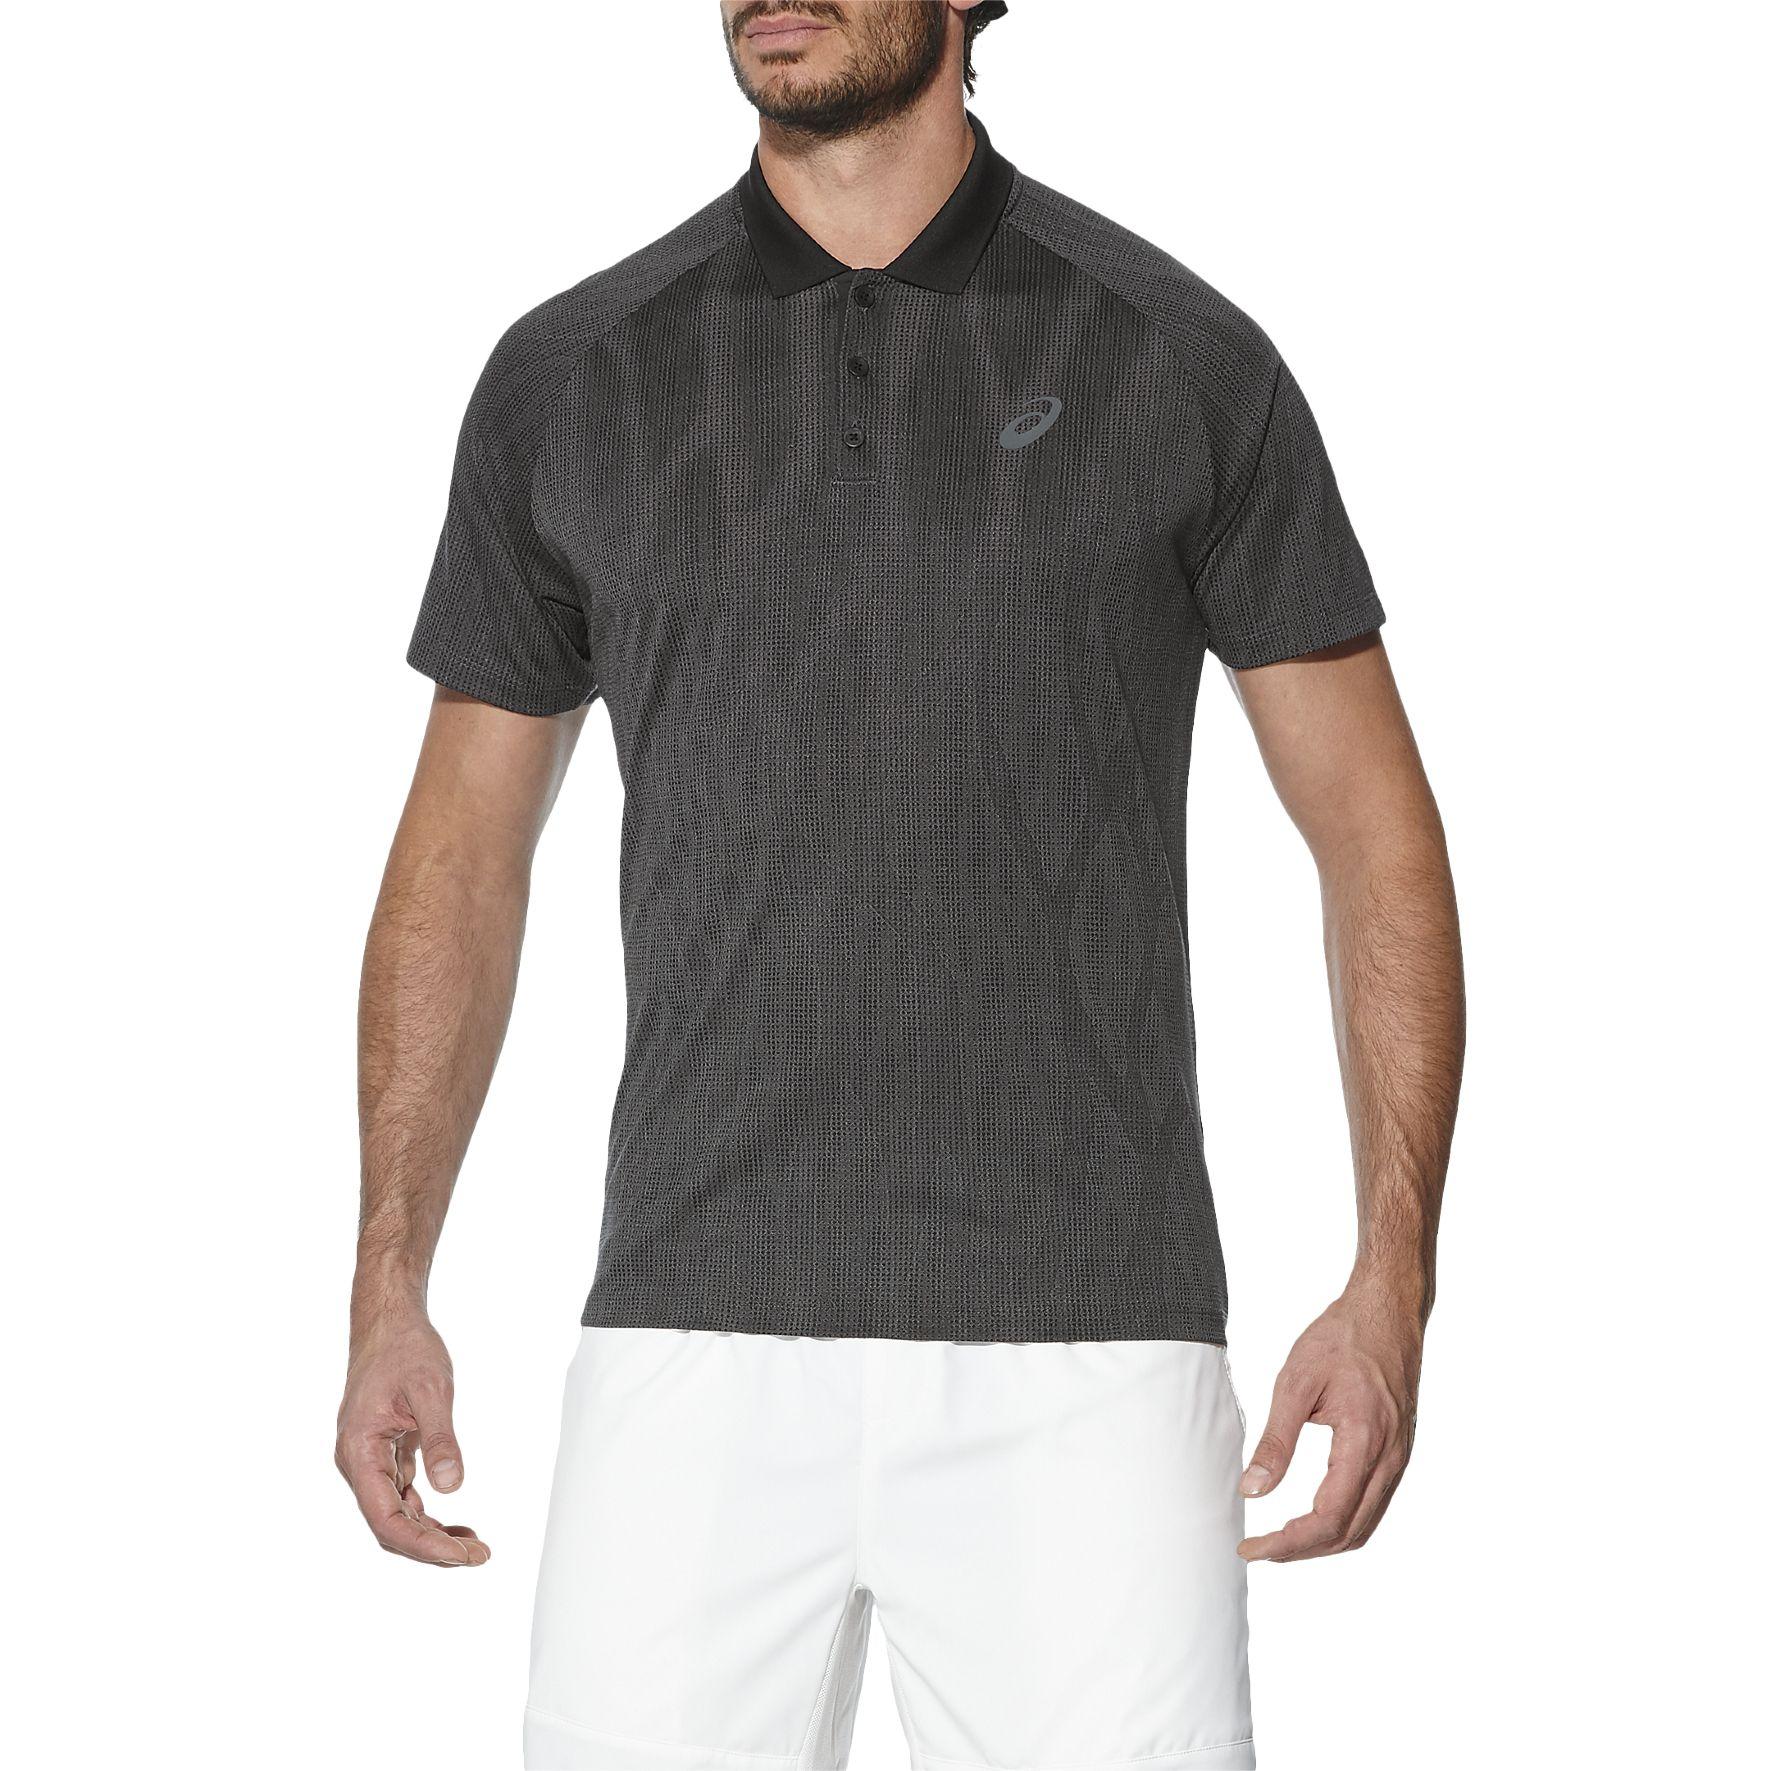 Asics Club Gpx Mens Tennis Polo